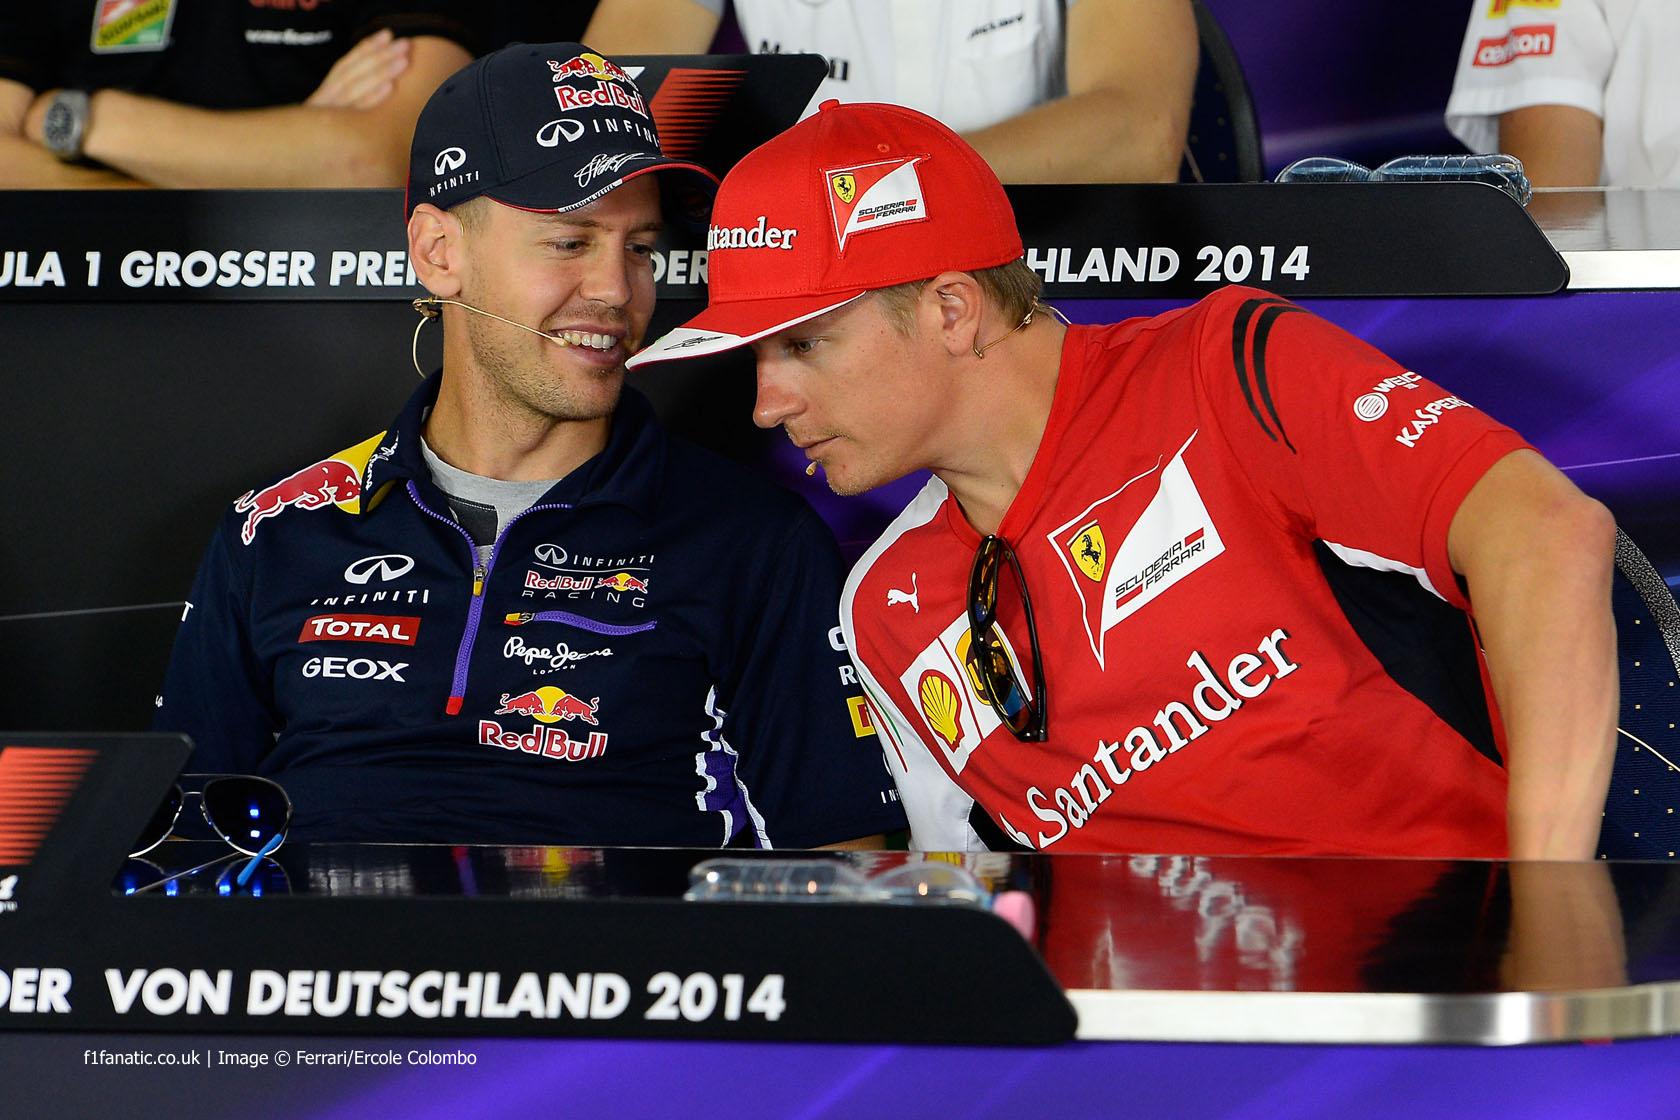 Sebastian Vettel, Kimi Raikkonen, Hockenheimring, 2014